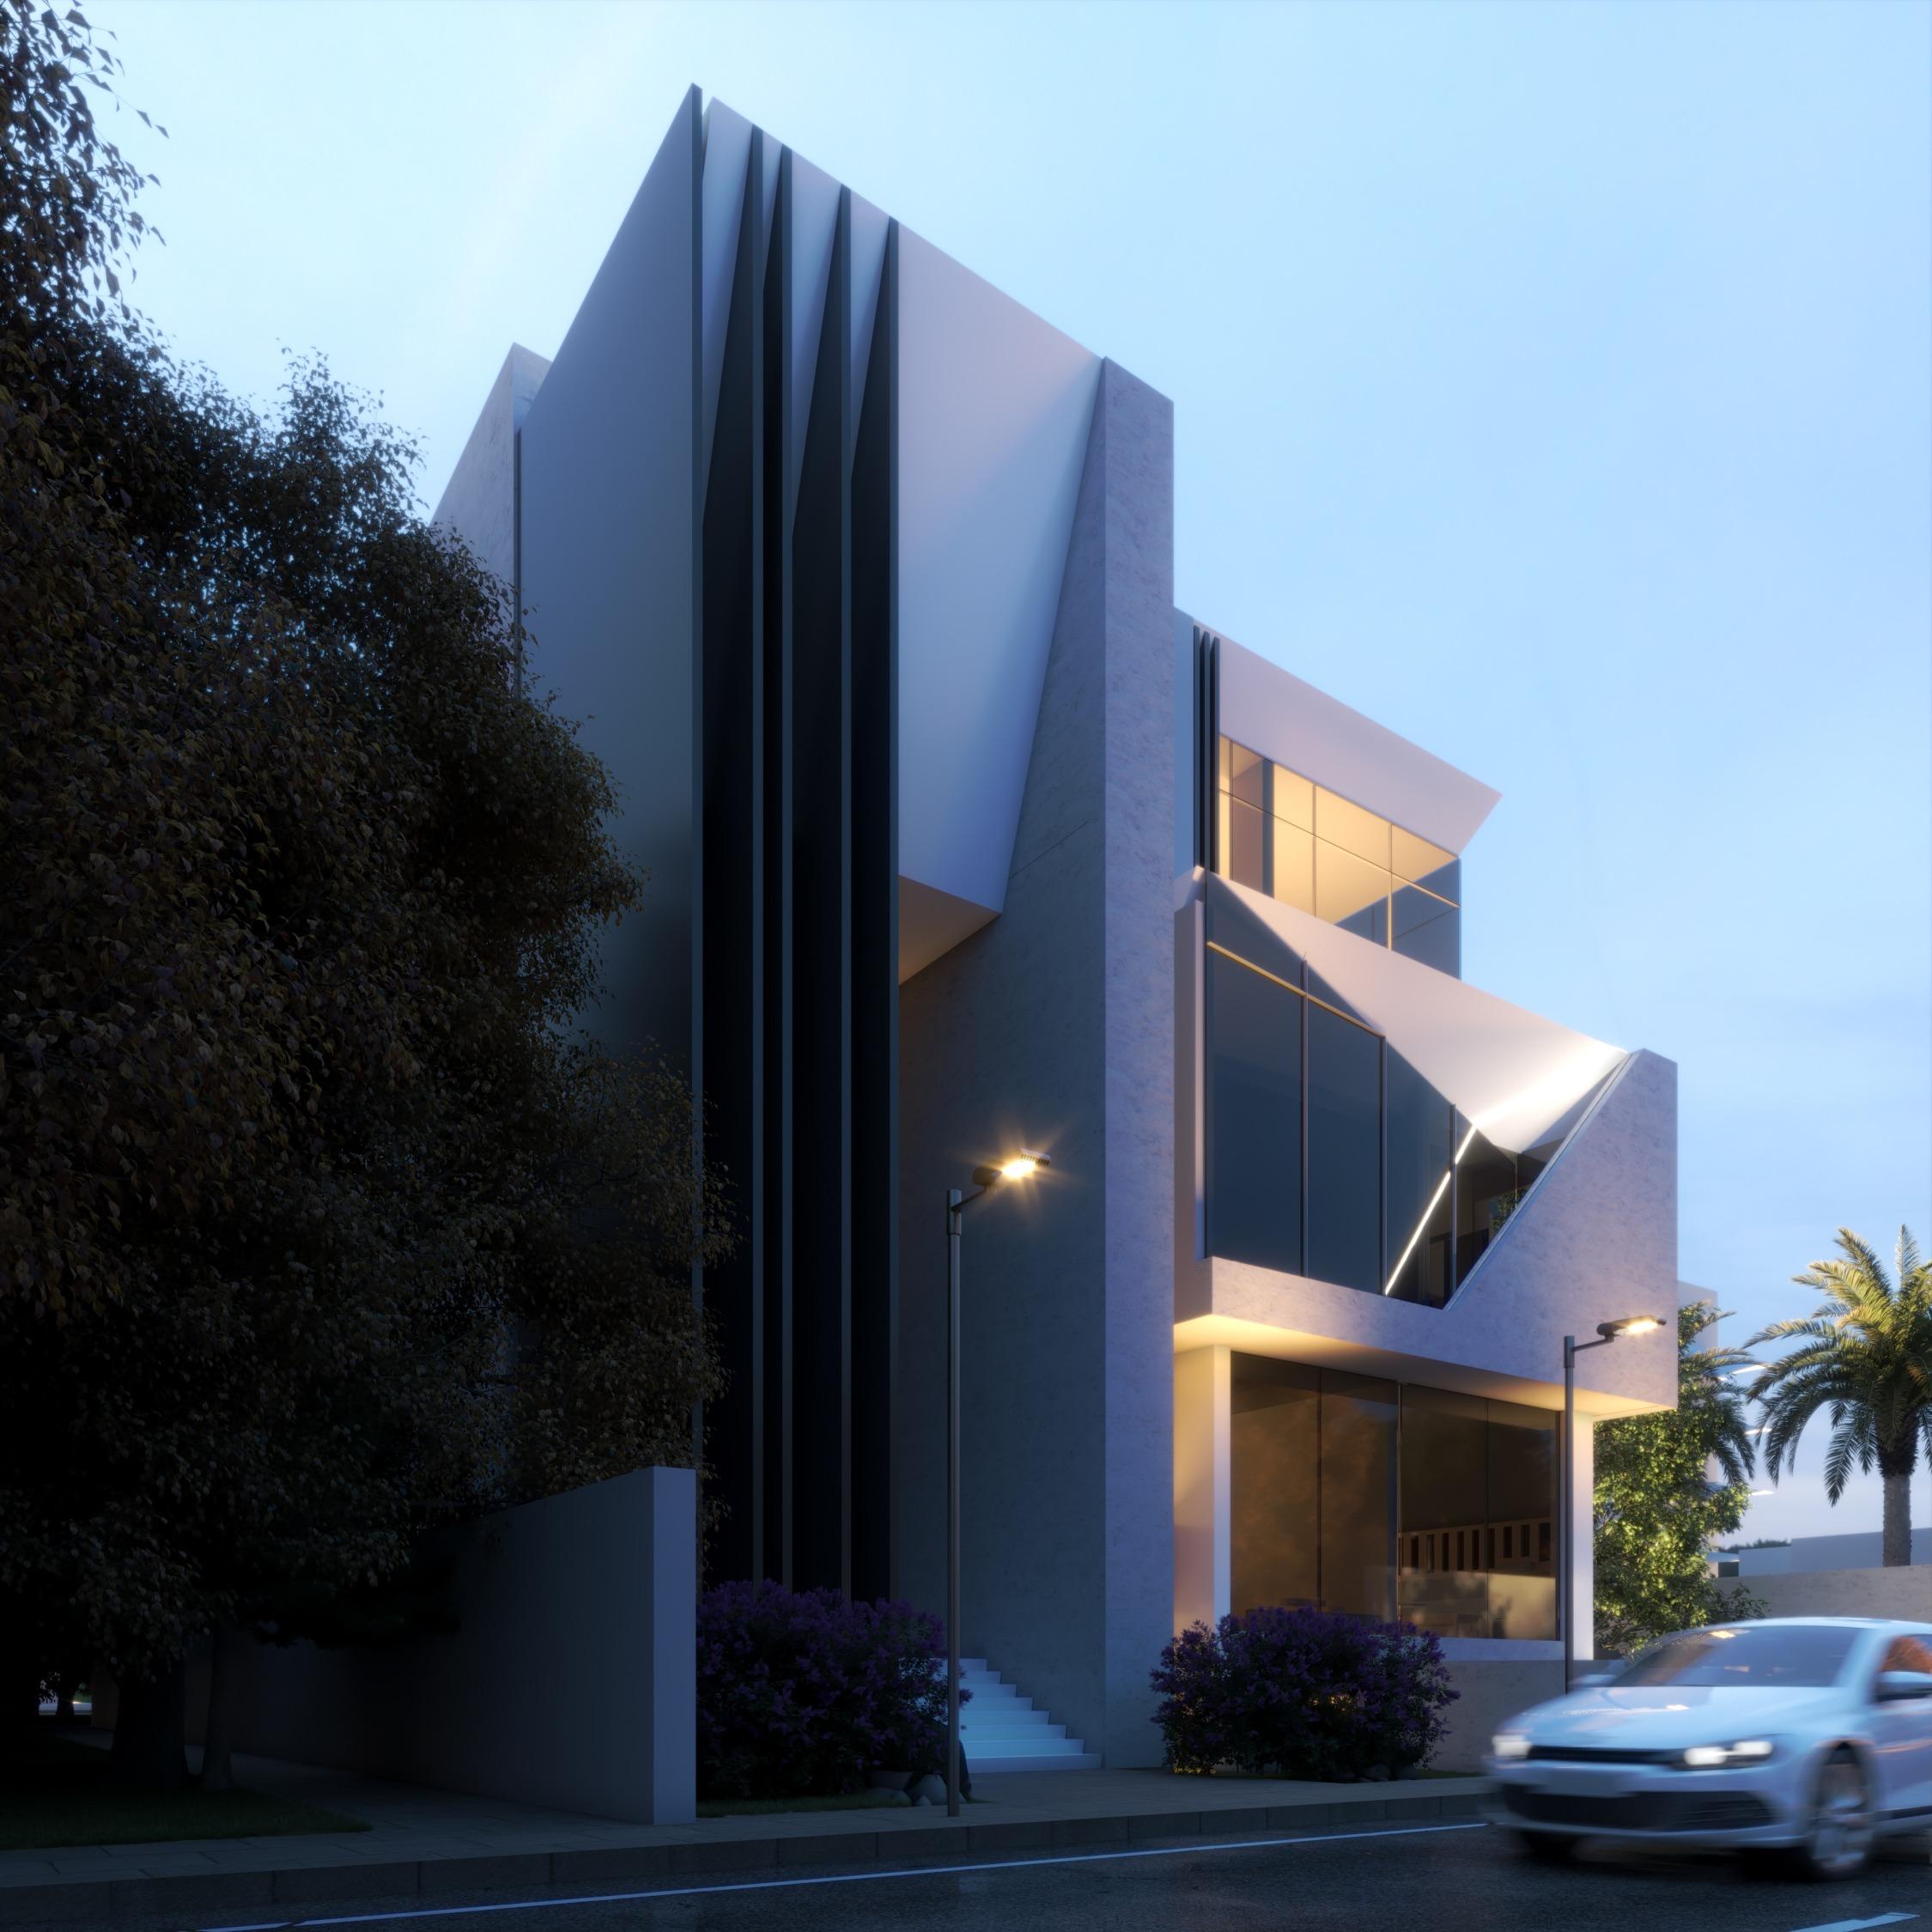 modern exterior design - day time - render